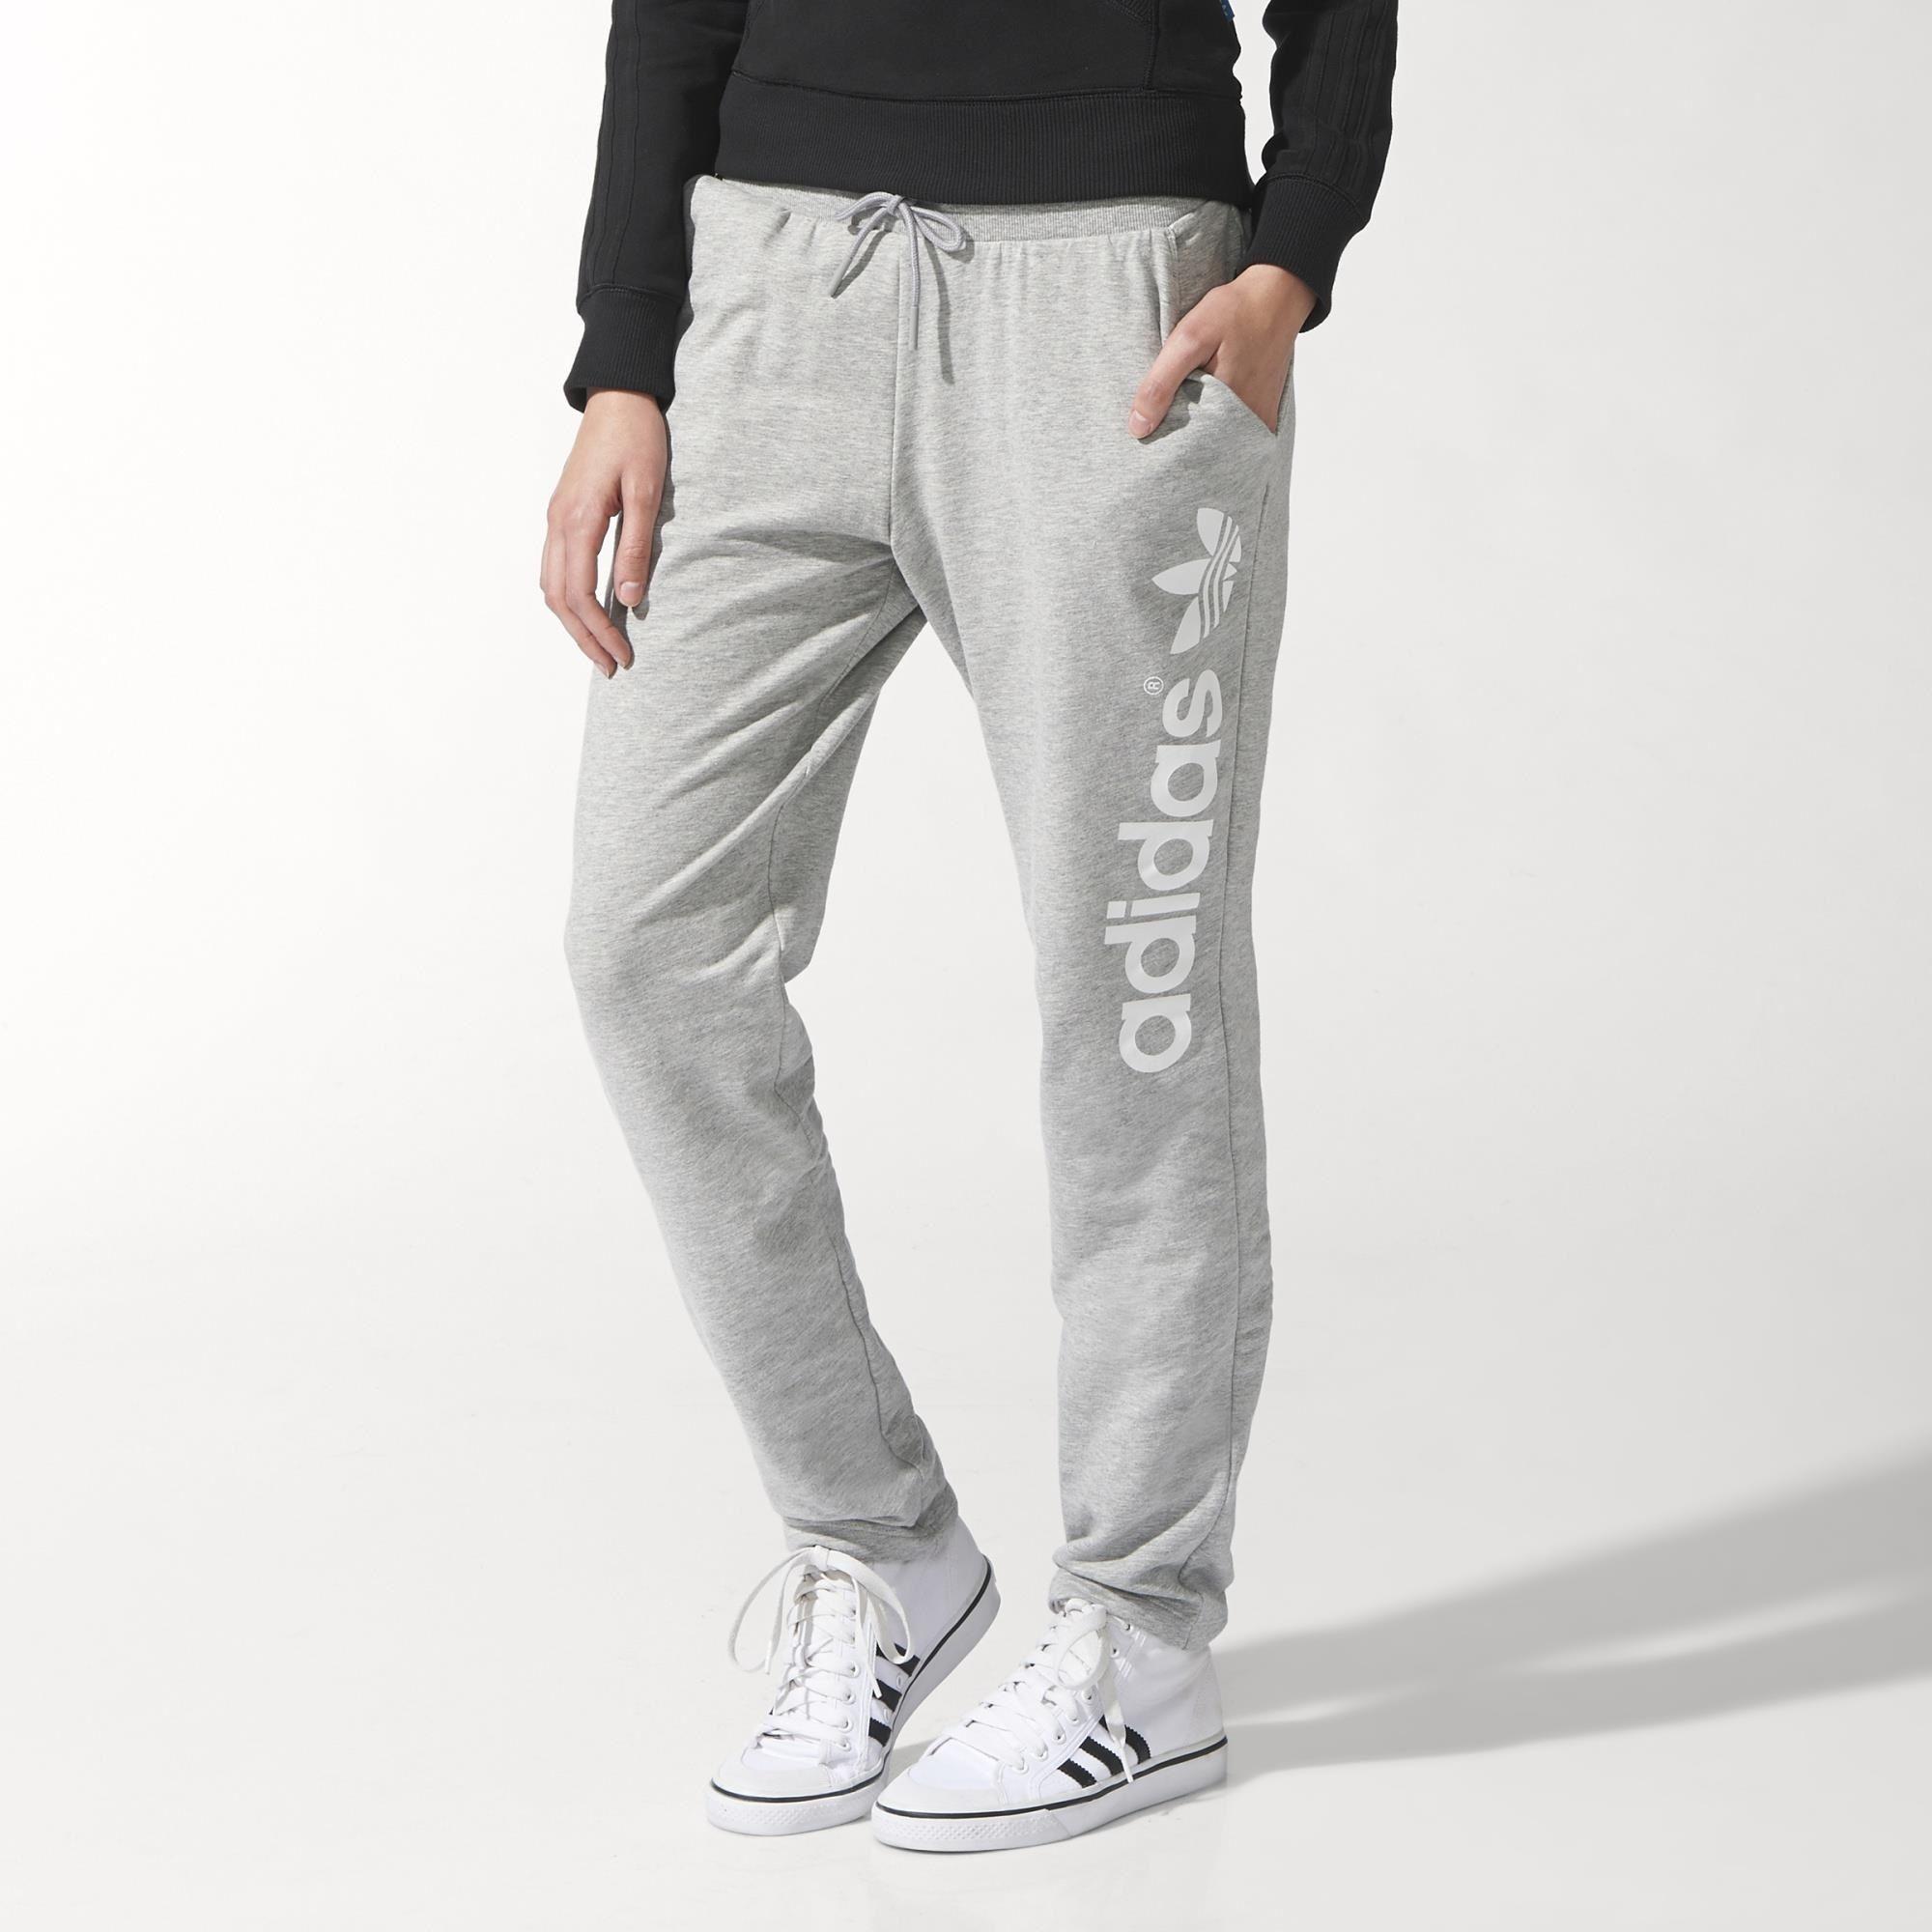 adidas - Light Logo Track Pants  1130e32cc